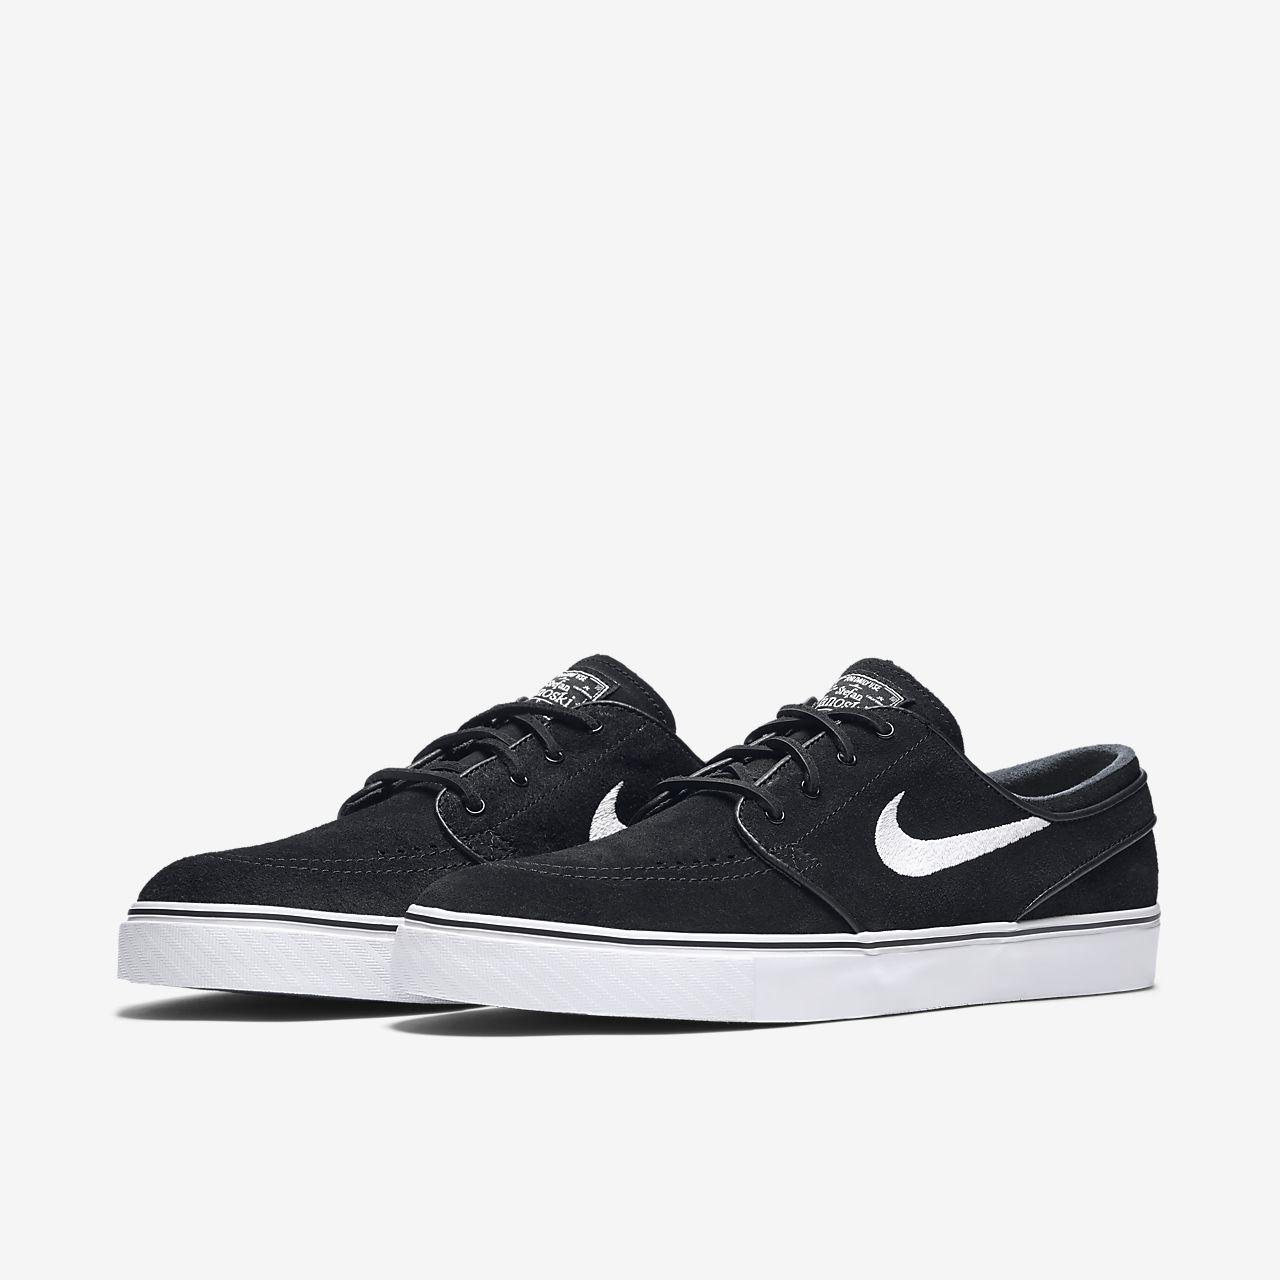 low priced d6db9 36748 Nike SB Zoom Stefan Janoski OG